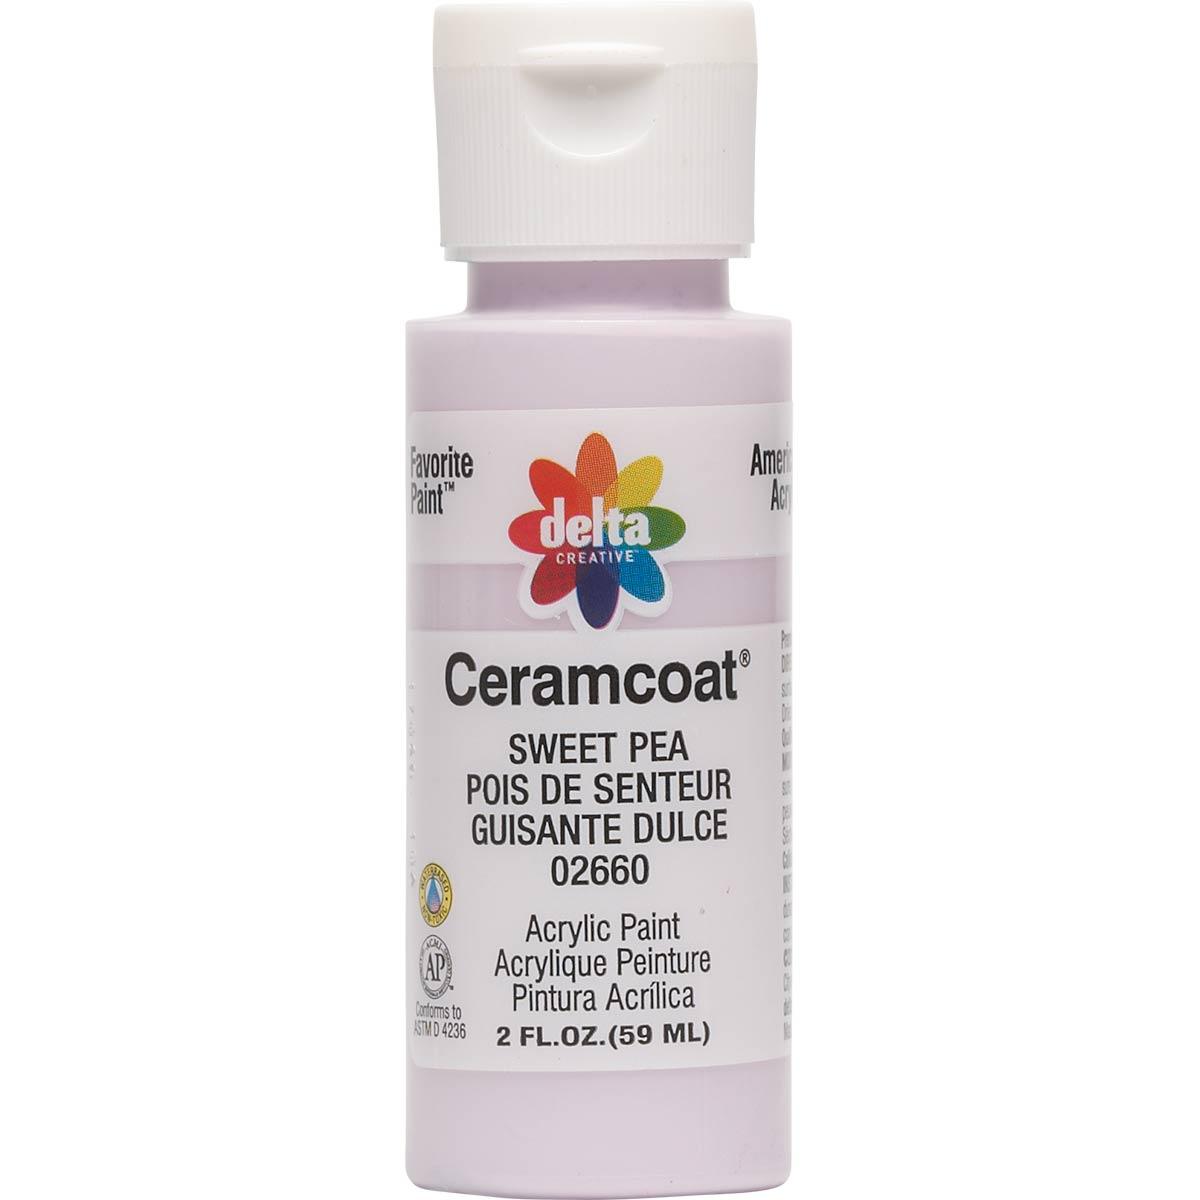 Delta Ceramcoat ® Acrylic Paint - Sweet Pea, 2 oz.